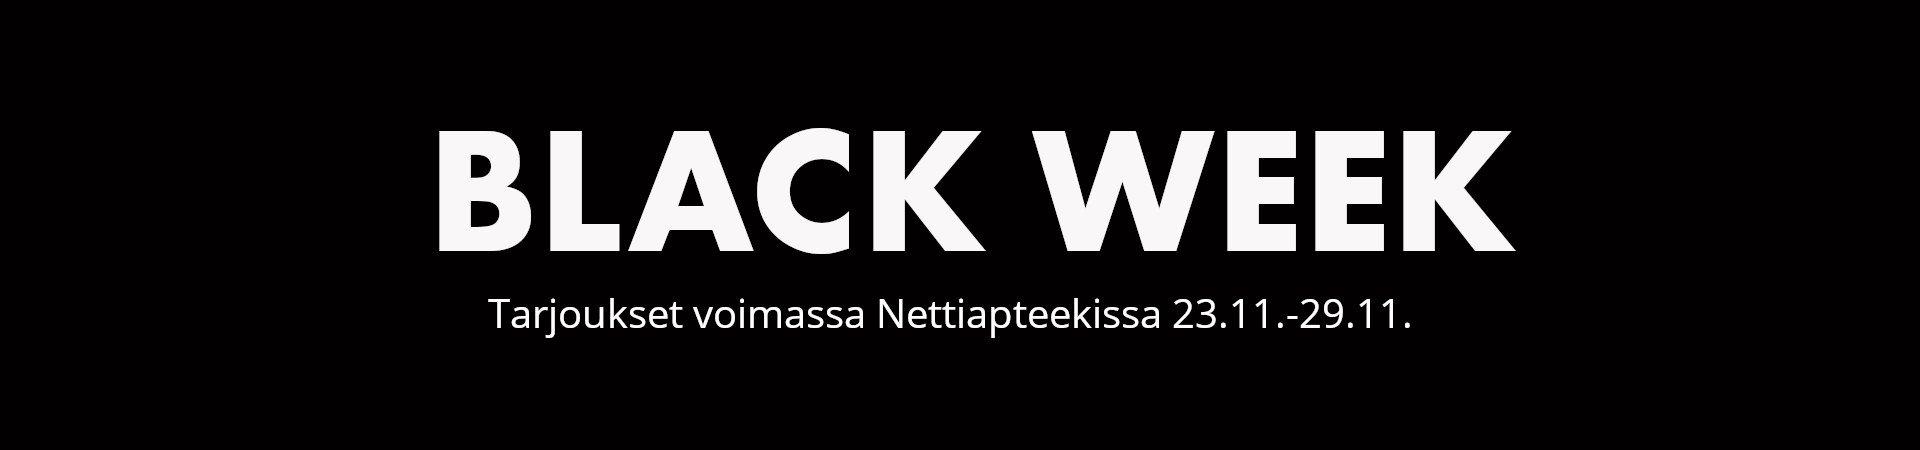 Black Week Nettiapteekissa